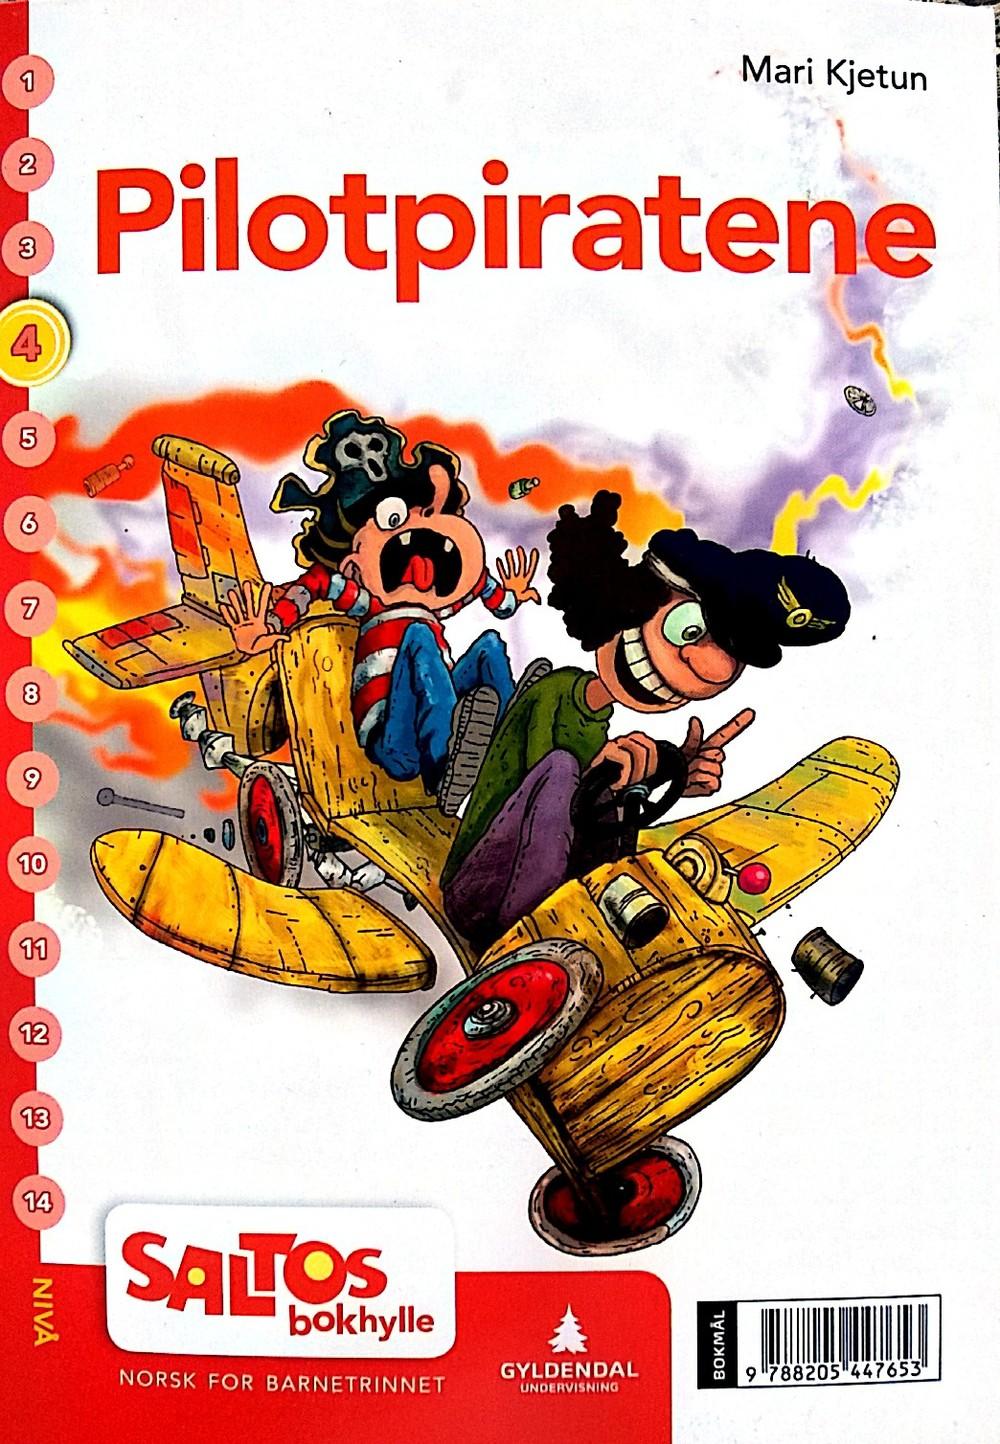 Pilotpiratene